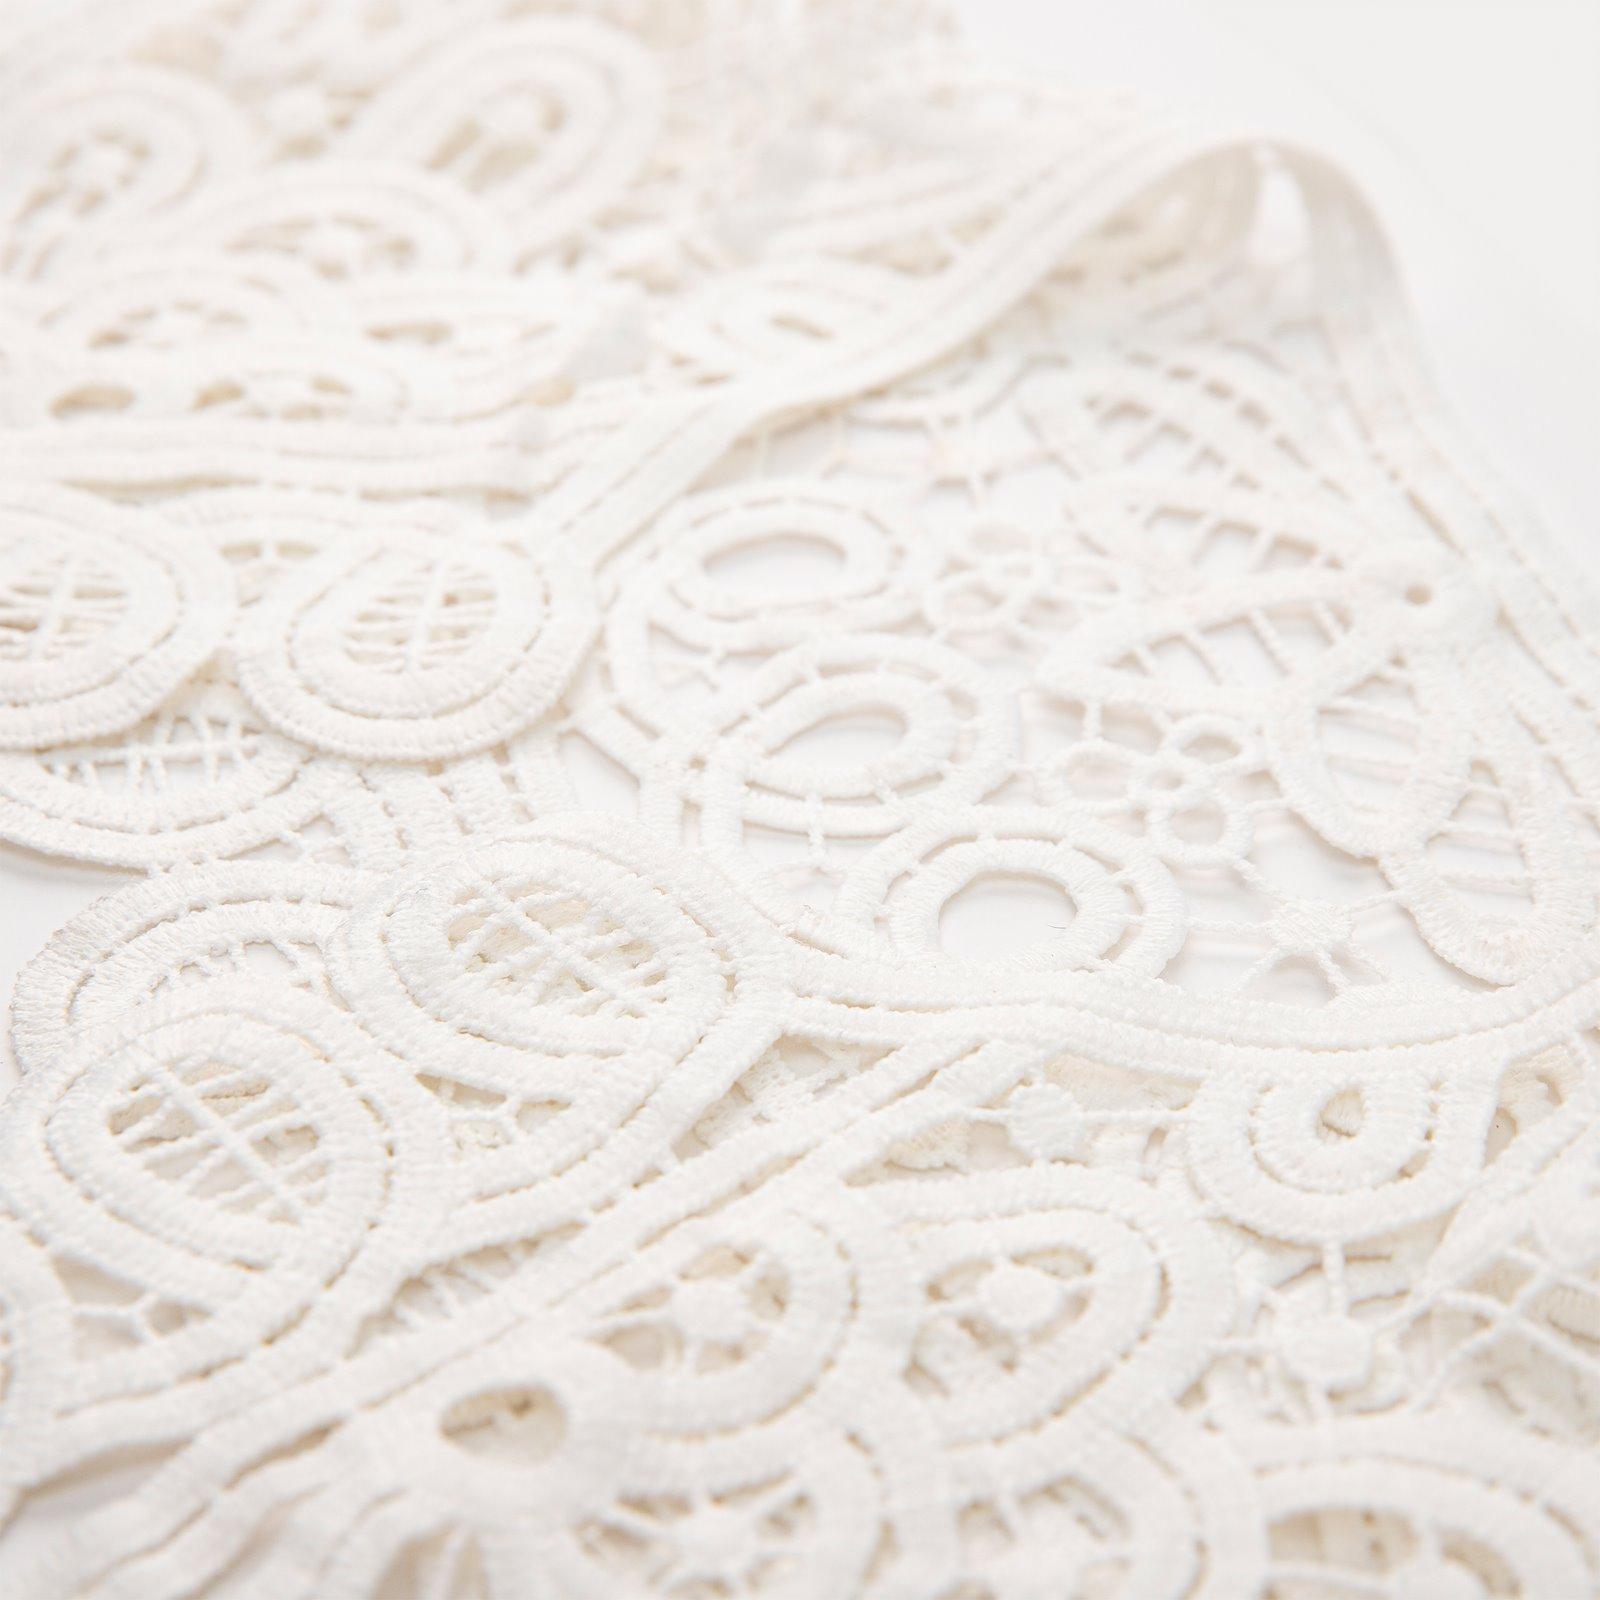 Cotton collar lace 70x17cm white 1pc 25161_sskit_b